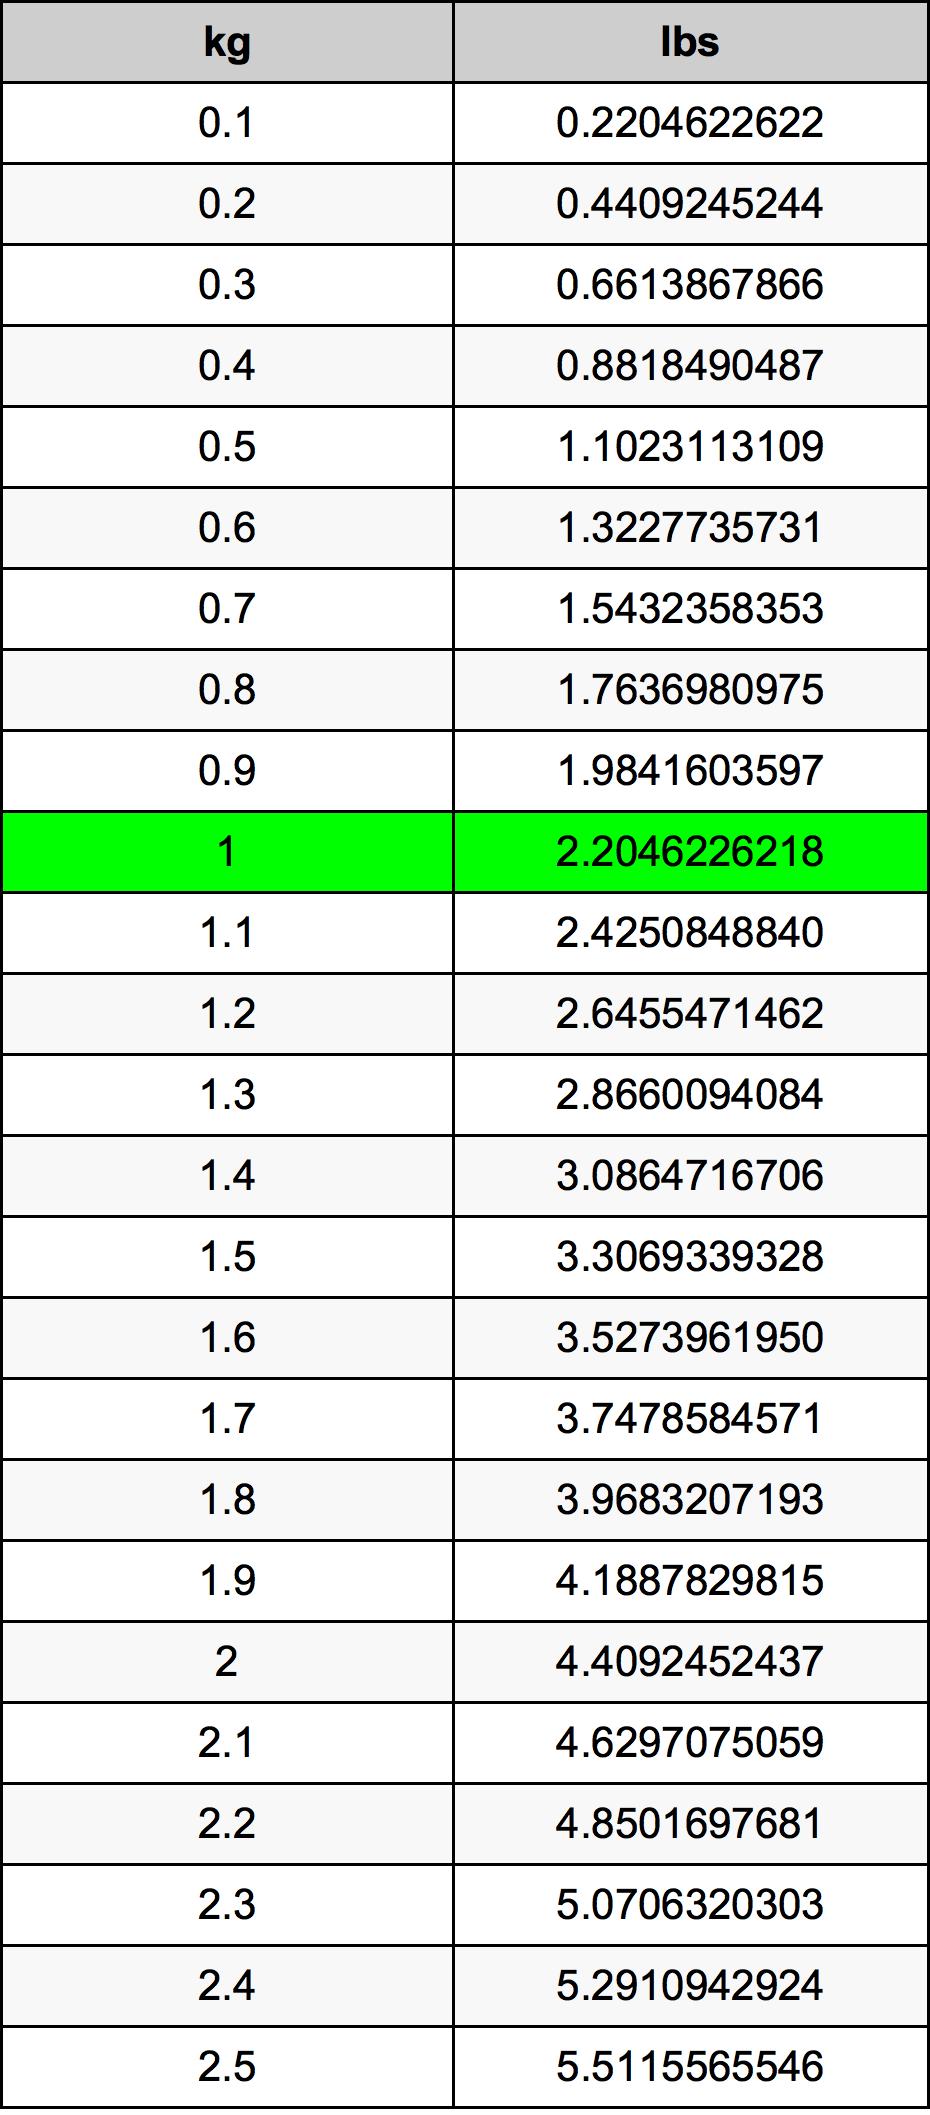 1 Kilogram Conversion Table